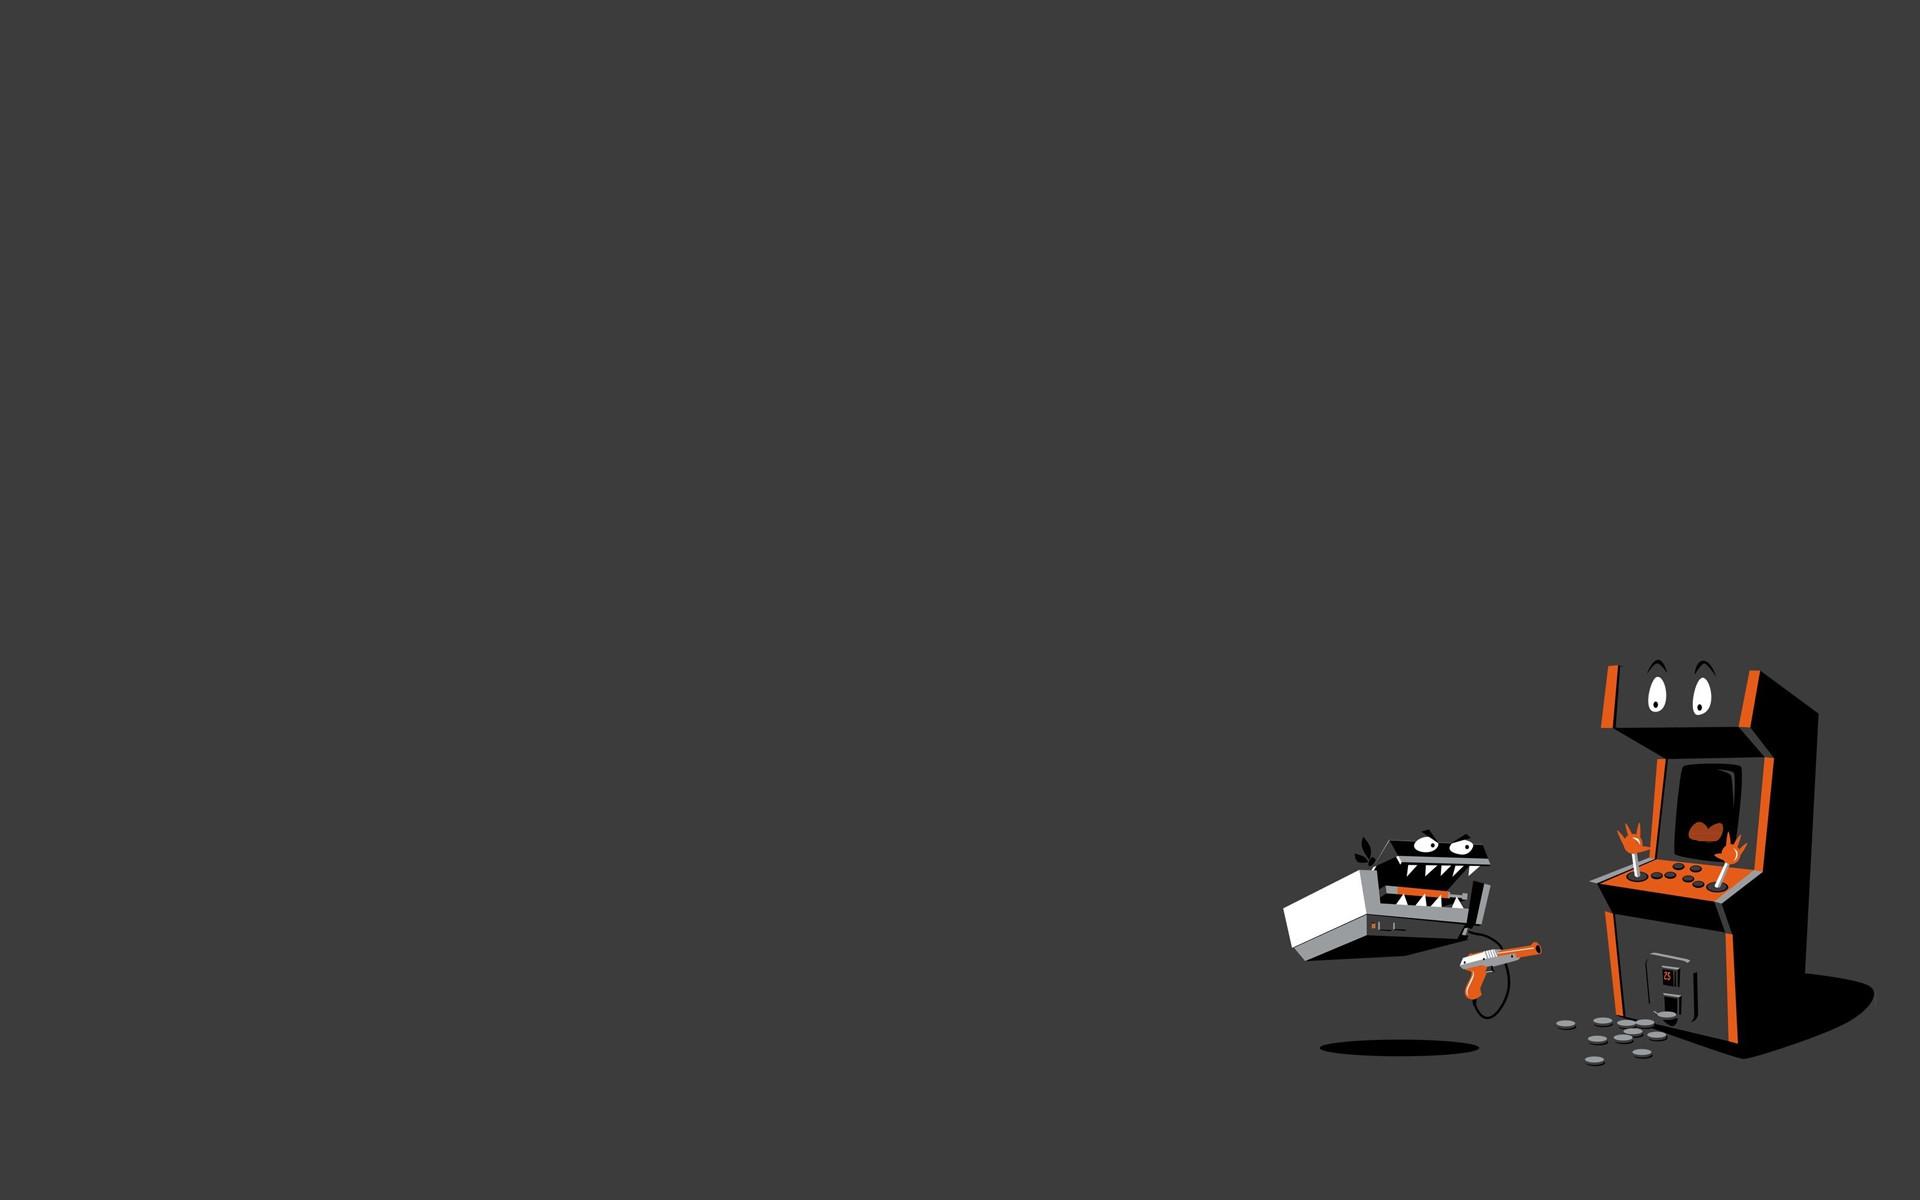 Video games minimalistic machines fun art wallpaper background